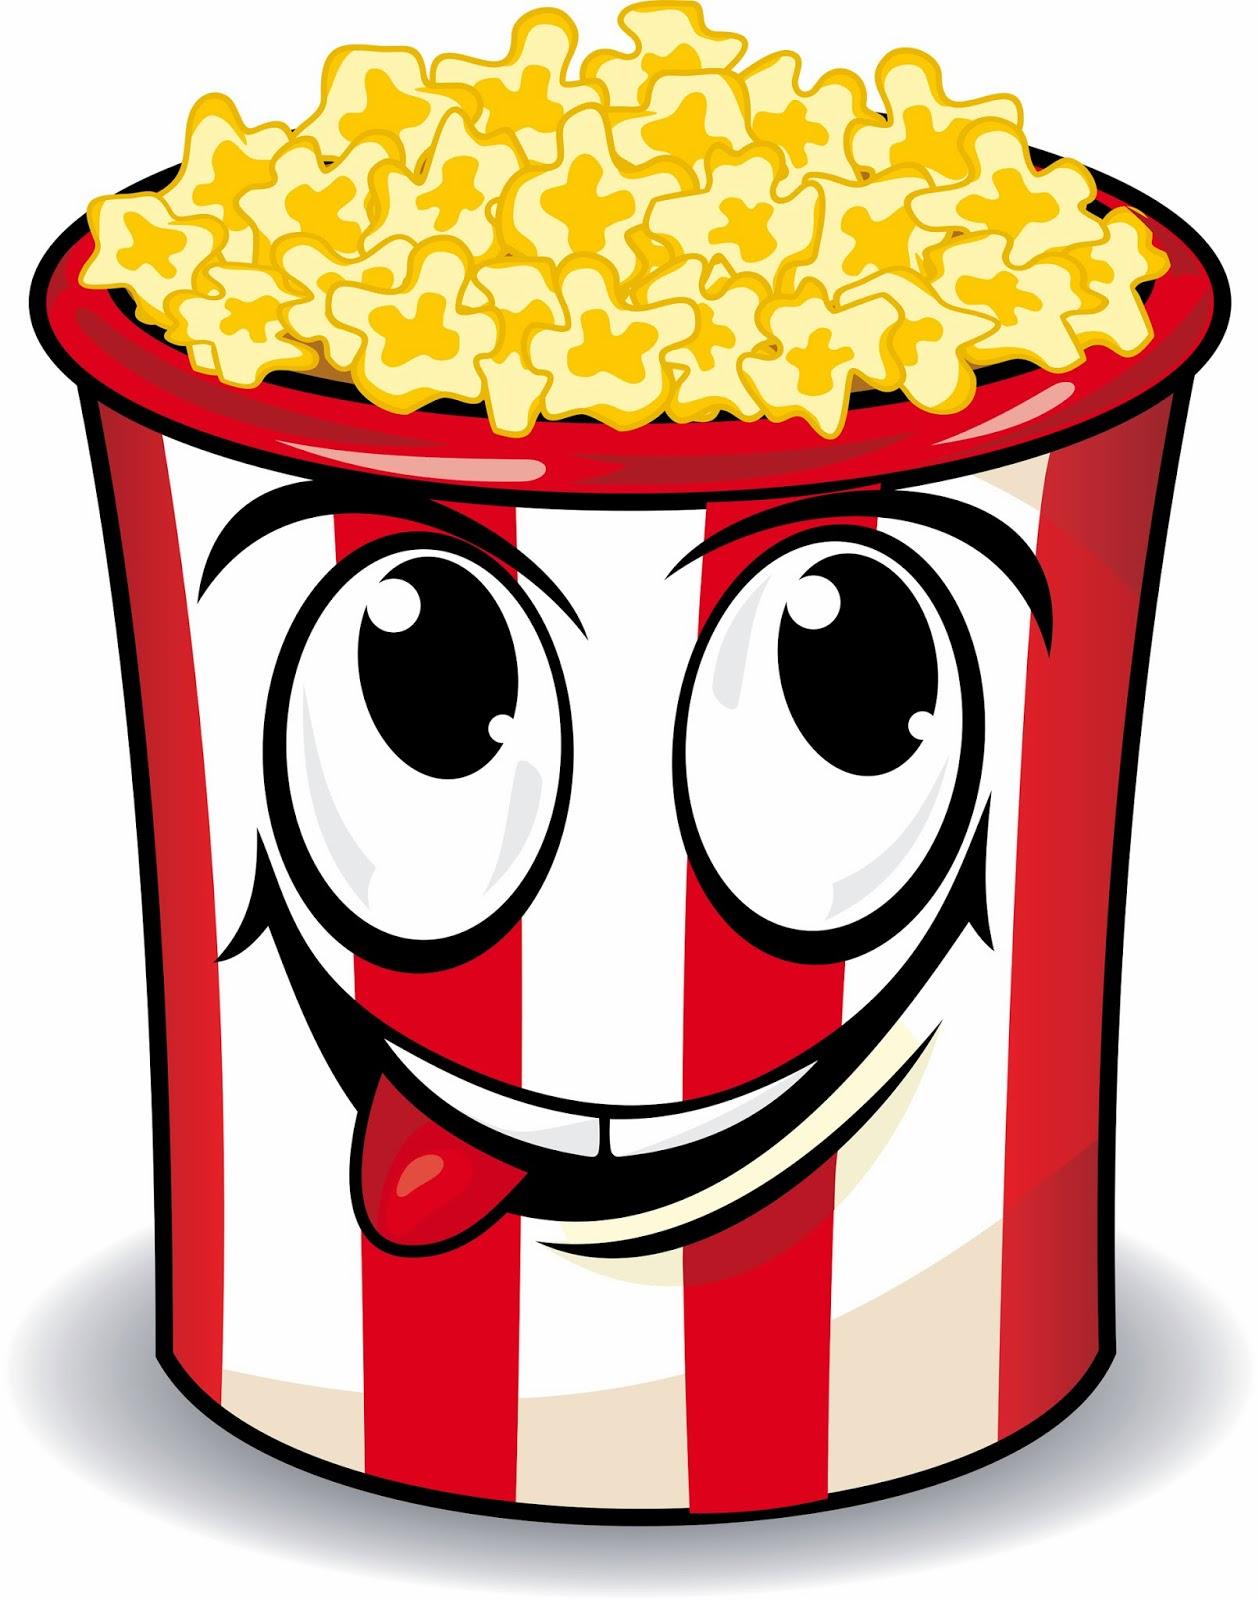 1259x1600 Free Popcorn Bowl Clipart Image